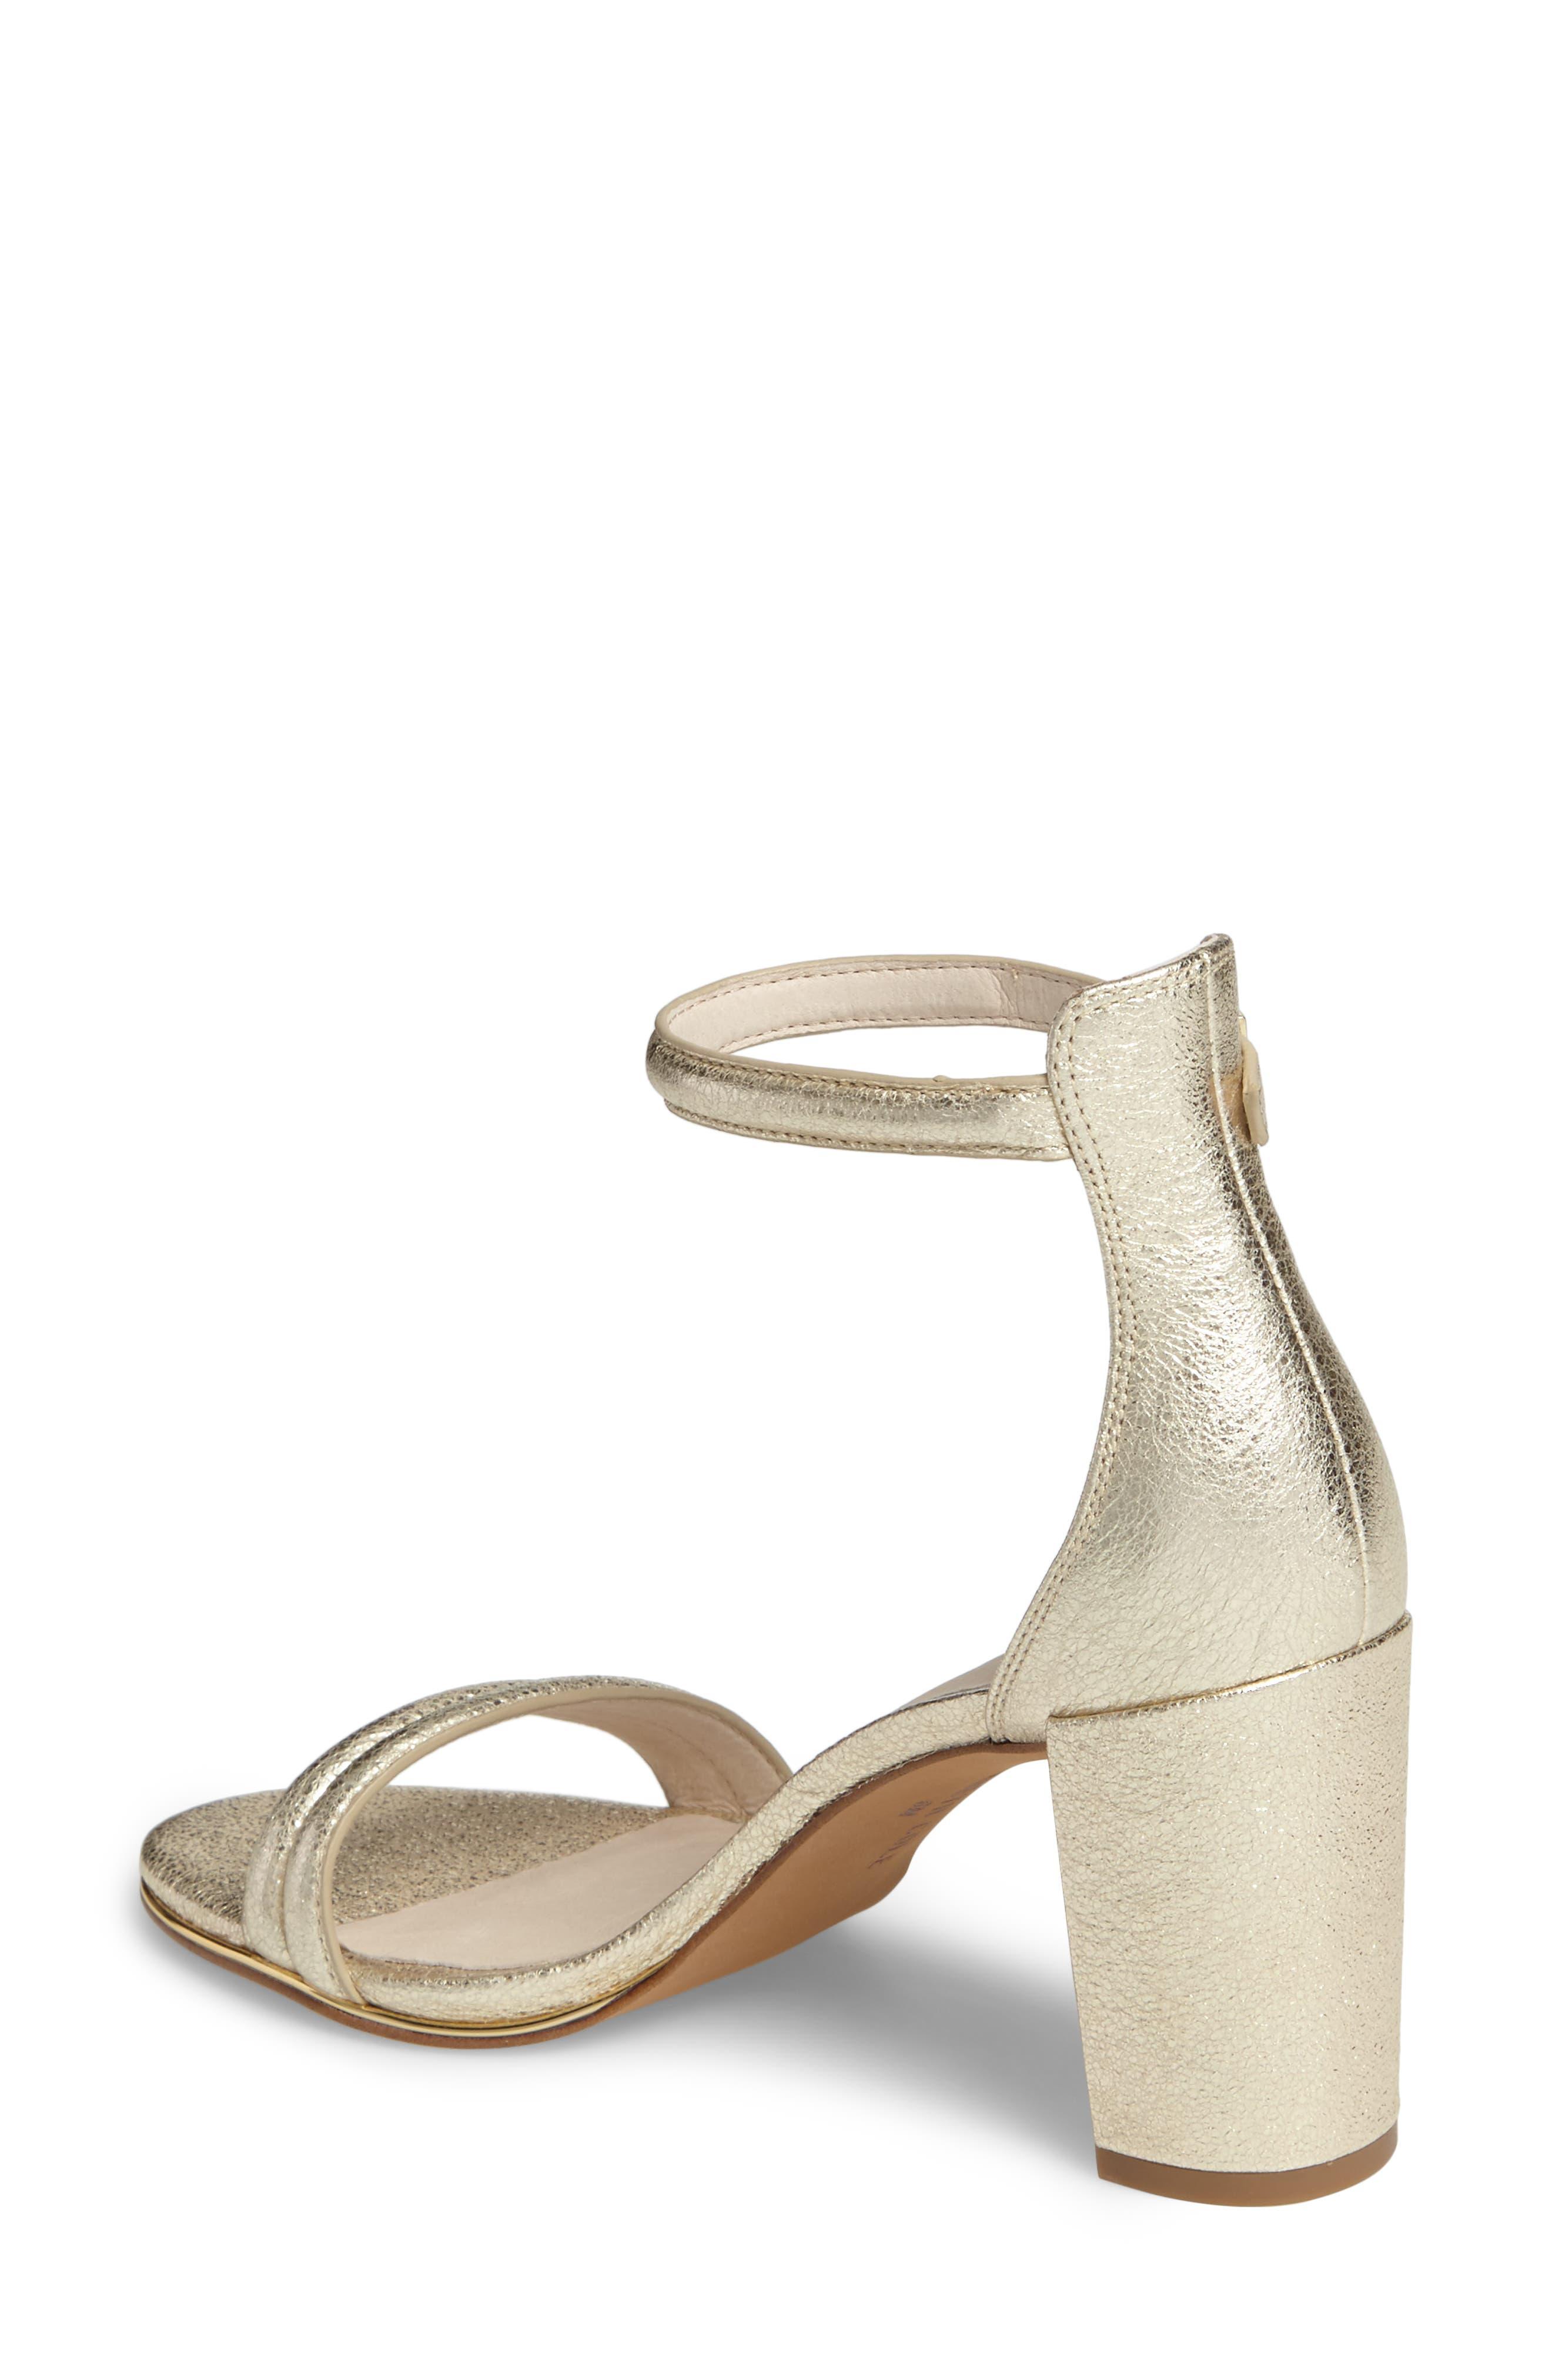 Alternate Image 2  - Kenneth Cole New York 'Lex' Ankle Strap Sandal (Women)